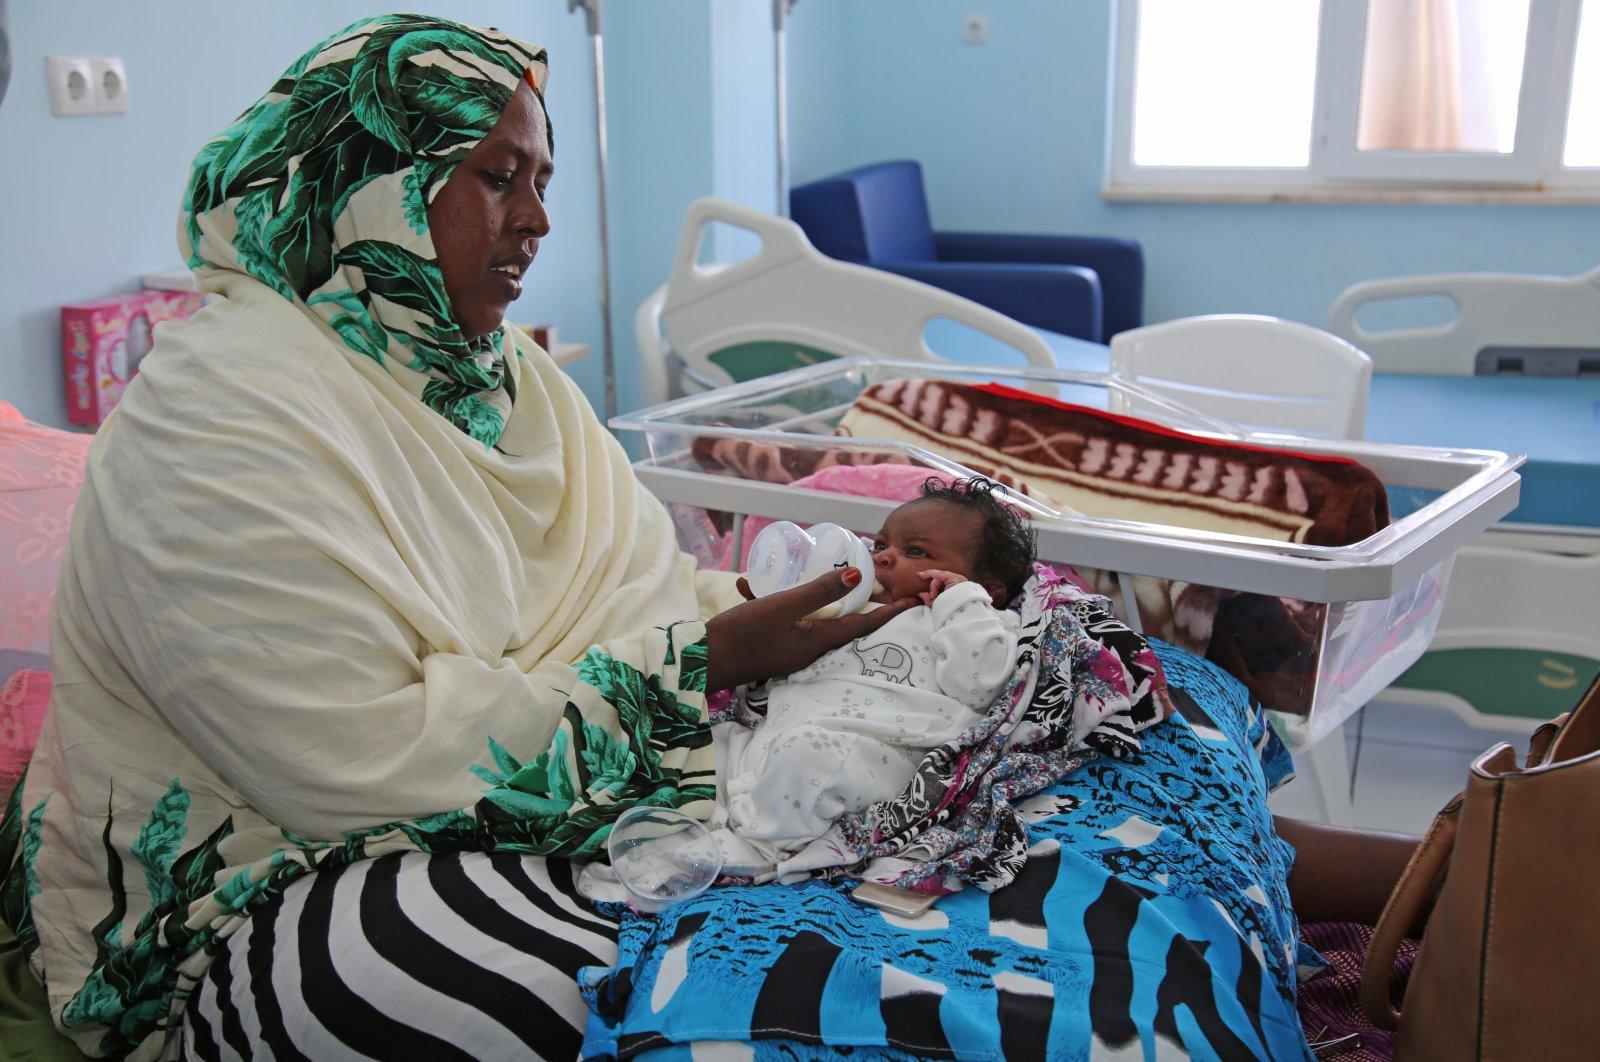 A woman feeds her baby in the Recep Tayyip Erdoğan Hospital, Mogadishu, Somalia, March 1, 2018. (AA Photo)